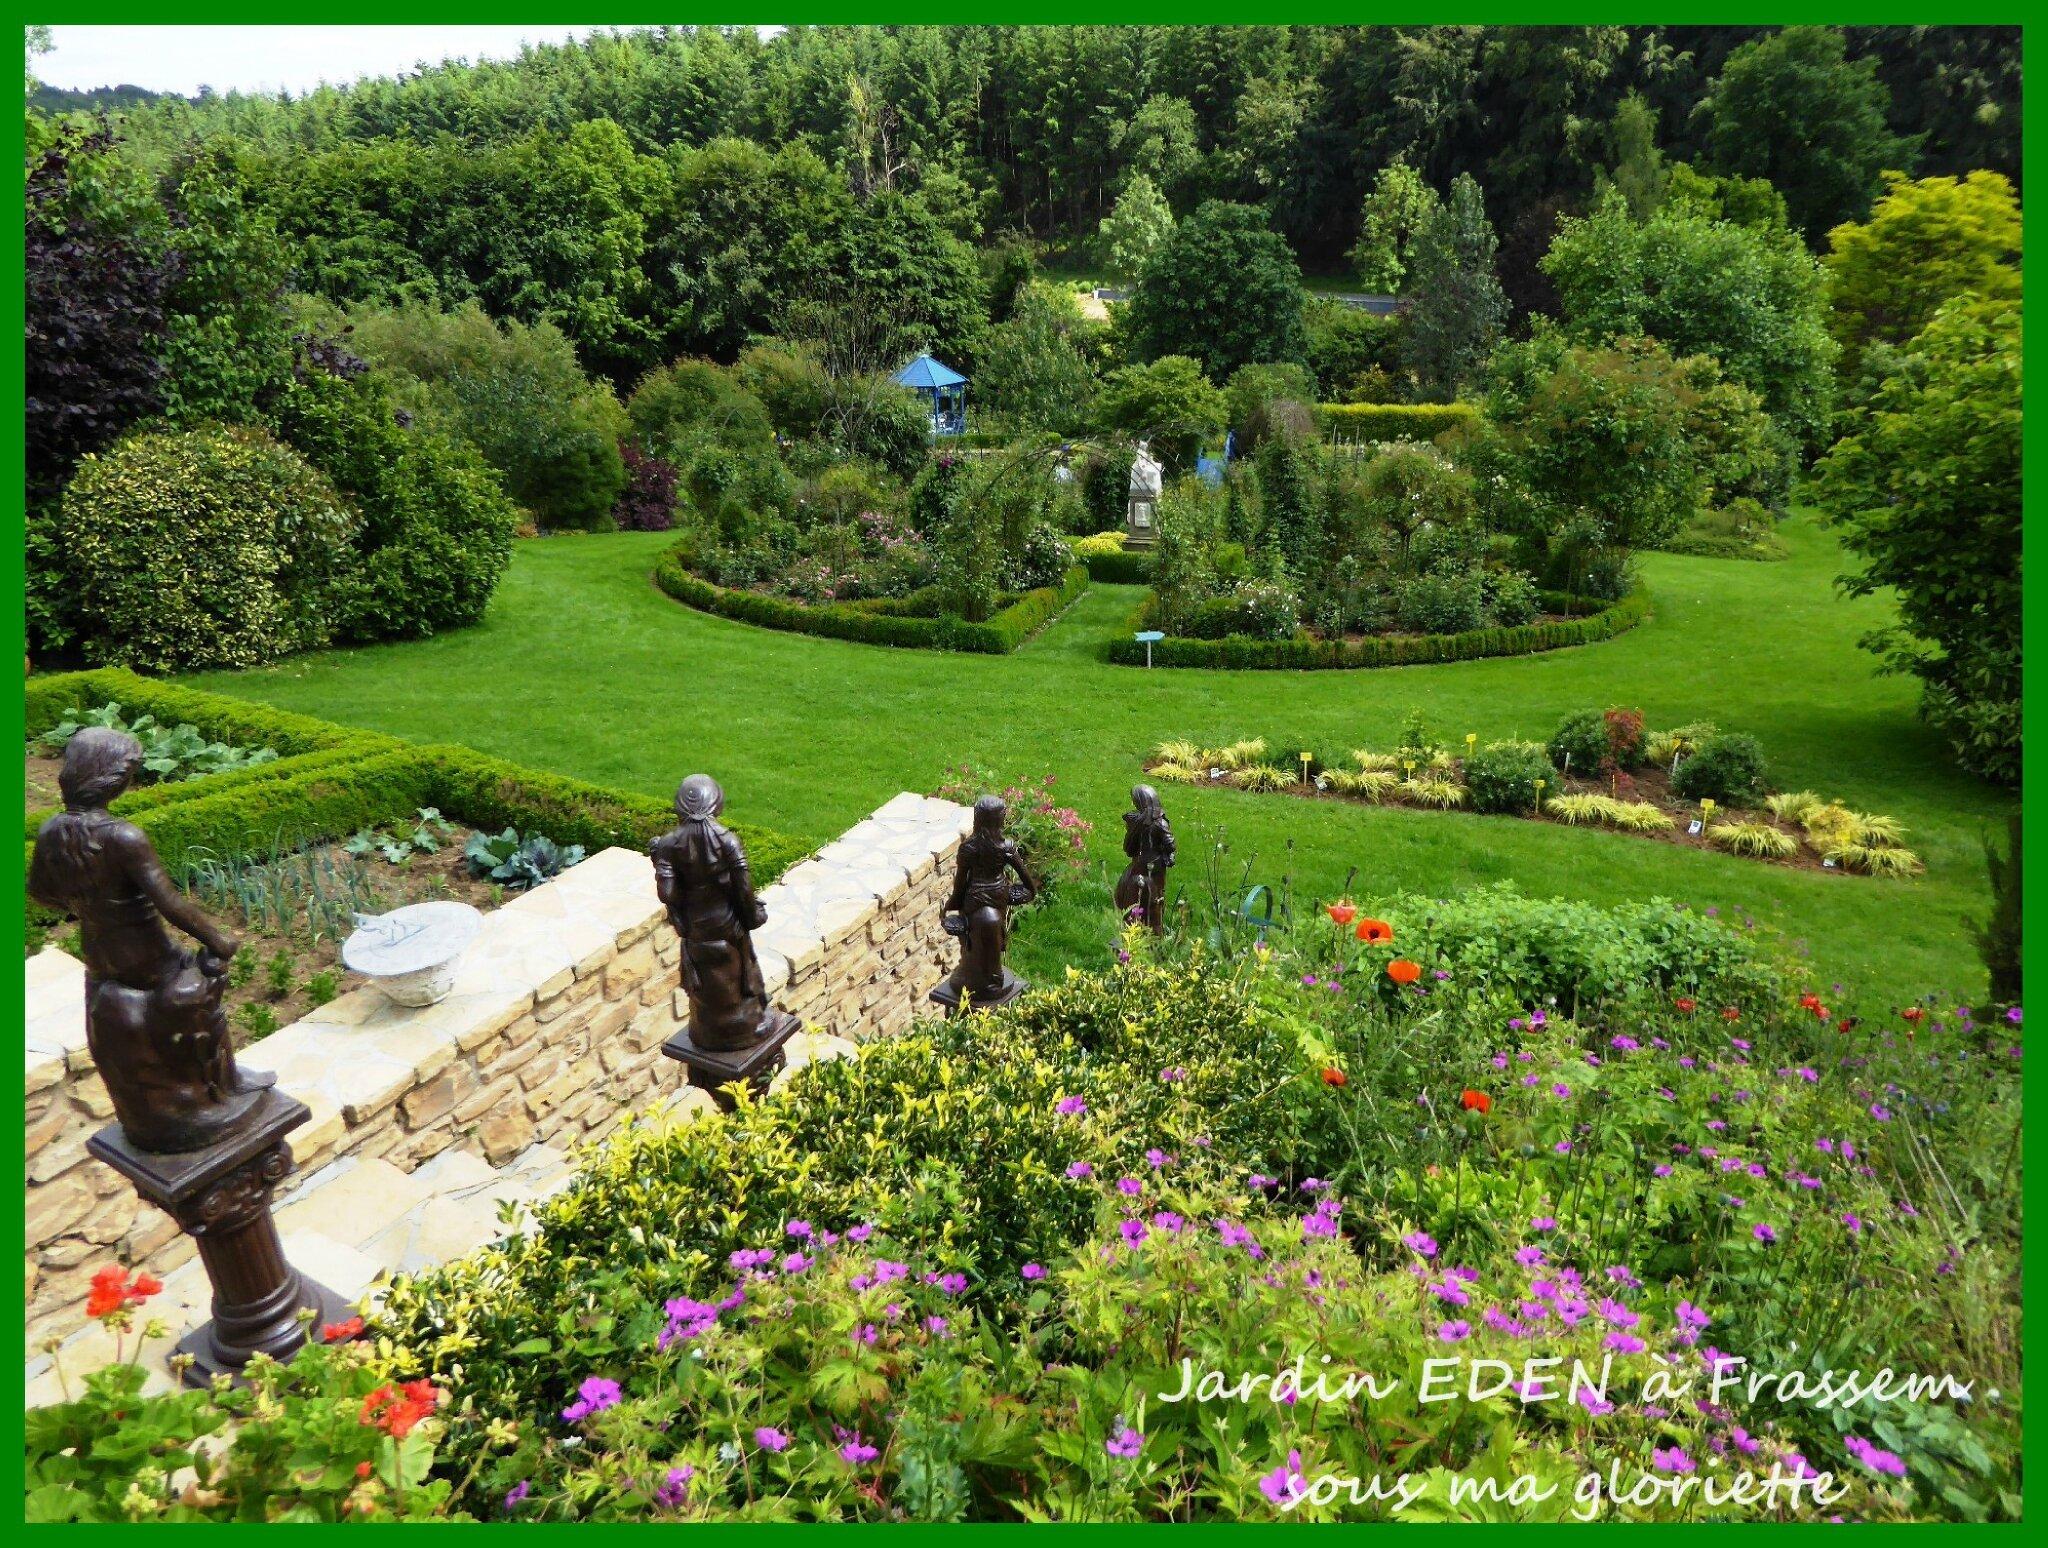 Jardin eden frassem belgique sous ma gloriette for Jardin eden prairie